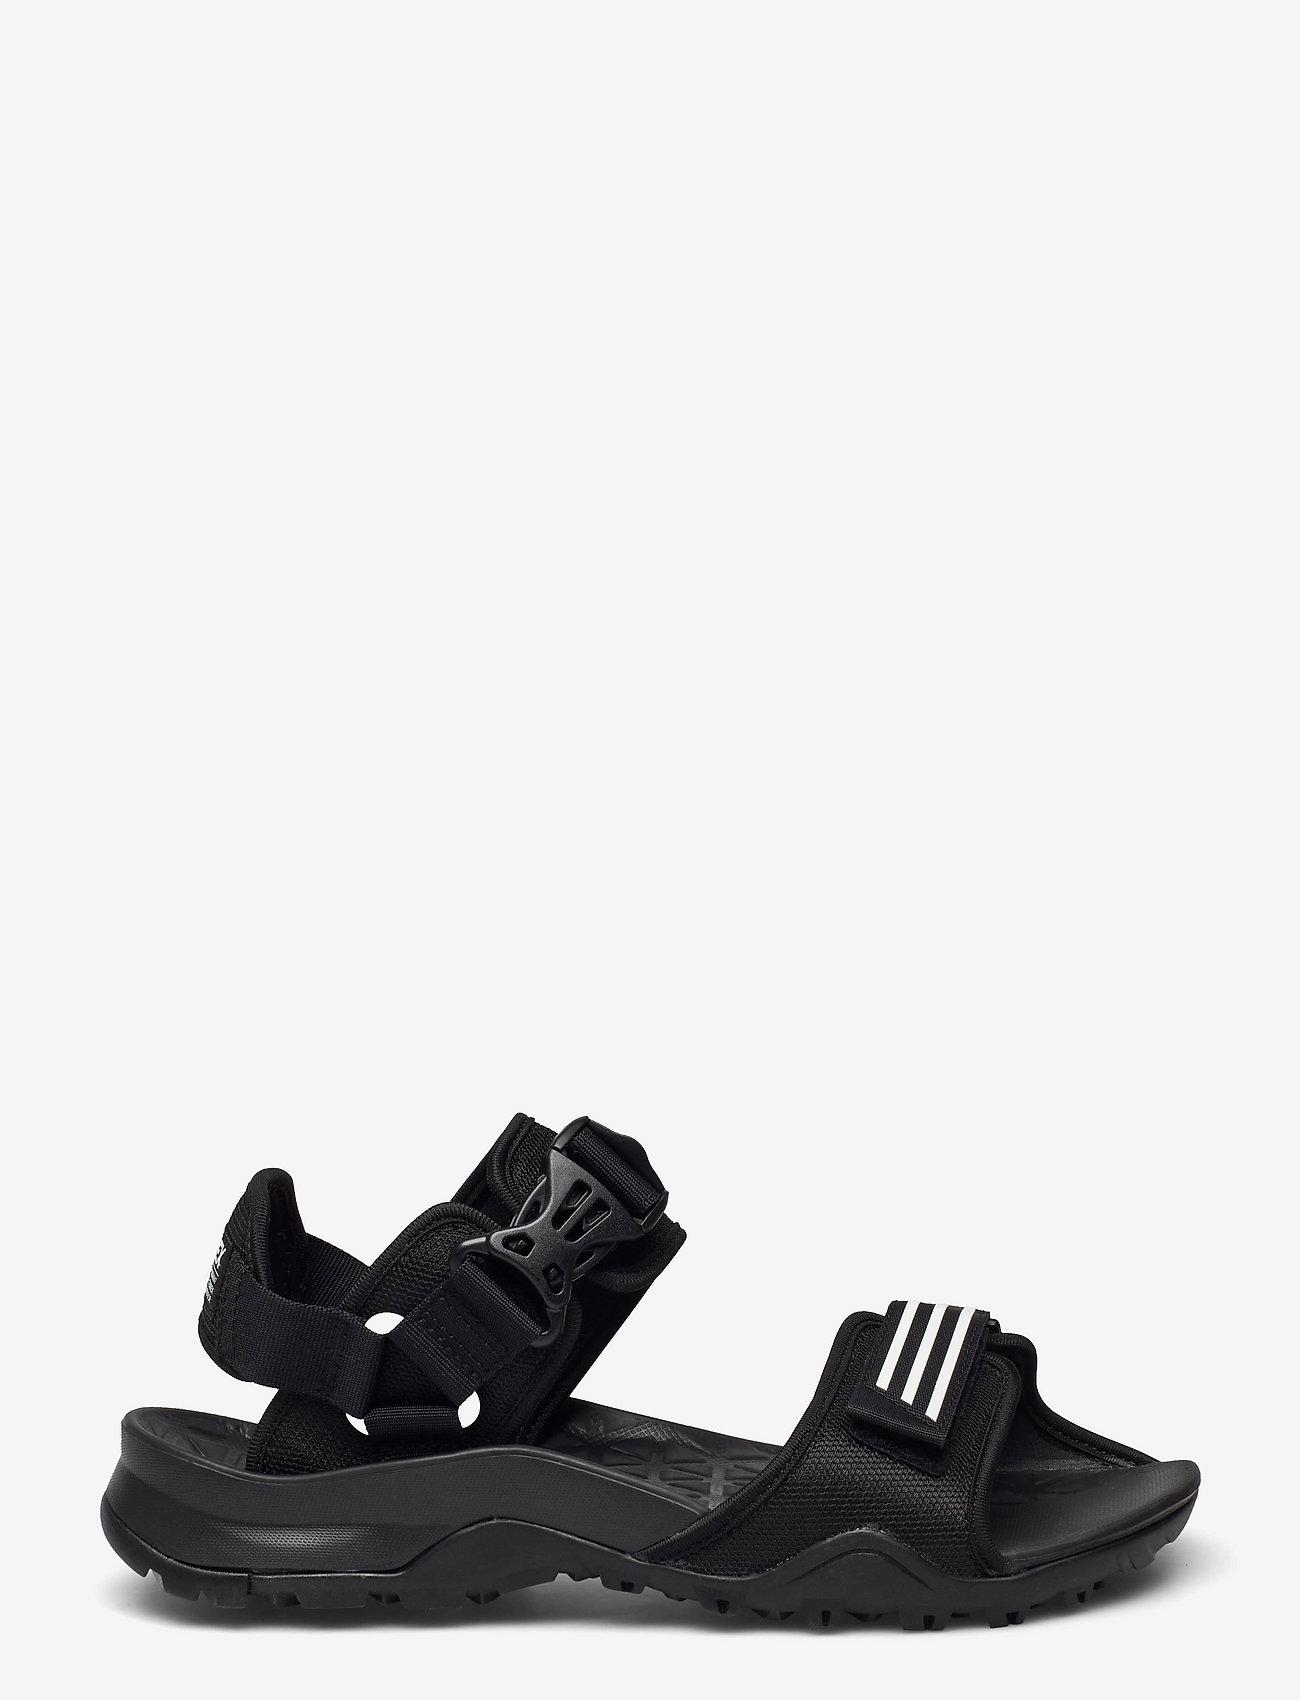 adidas Performance - Terrex Cyprex Ultra II DLX Sandals - vandringssandaler - cblack/ftwwht/cblack - 1